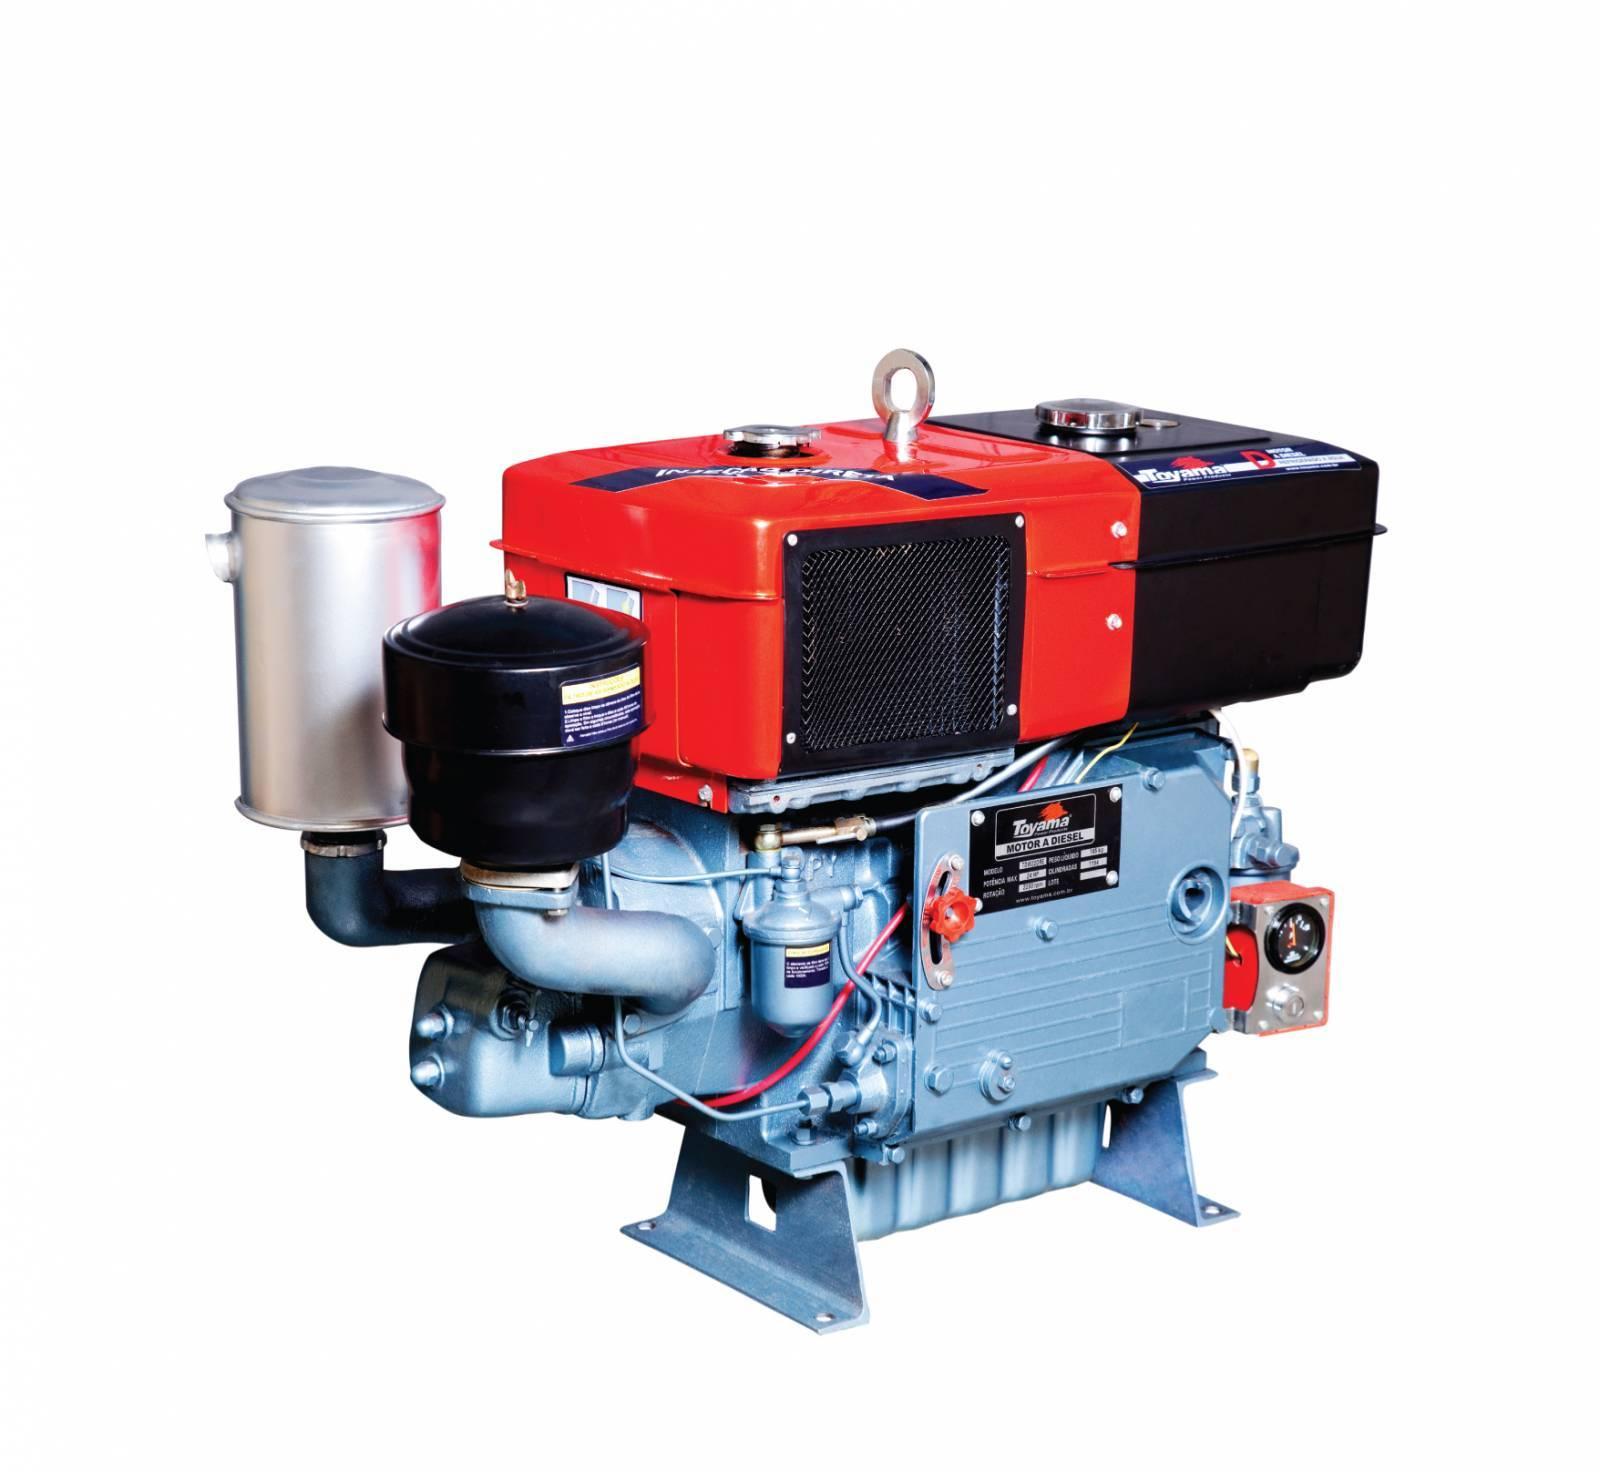 Motor diesel TDW18D2 TOYAMA 16,5 hp refrigerado água com sif - Hs Floresta e Jardim